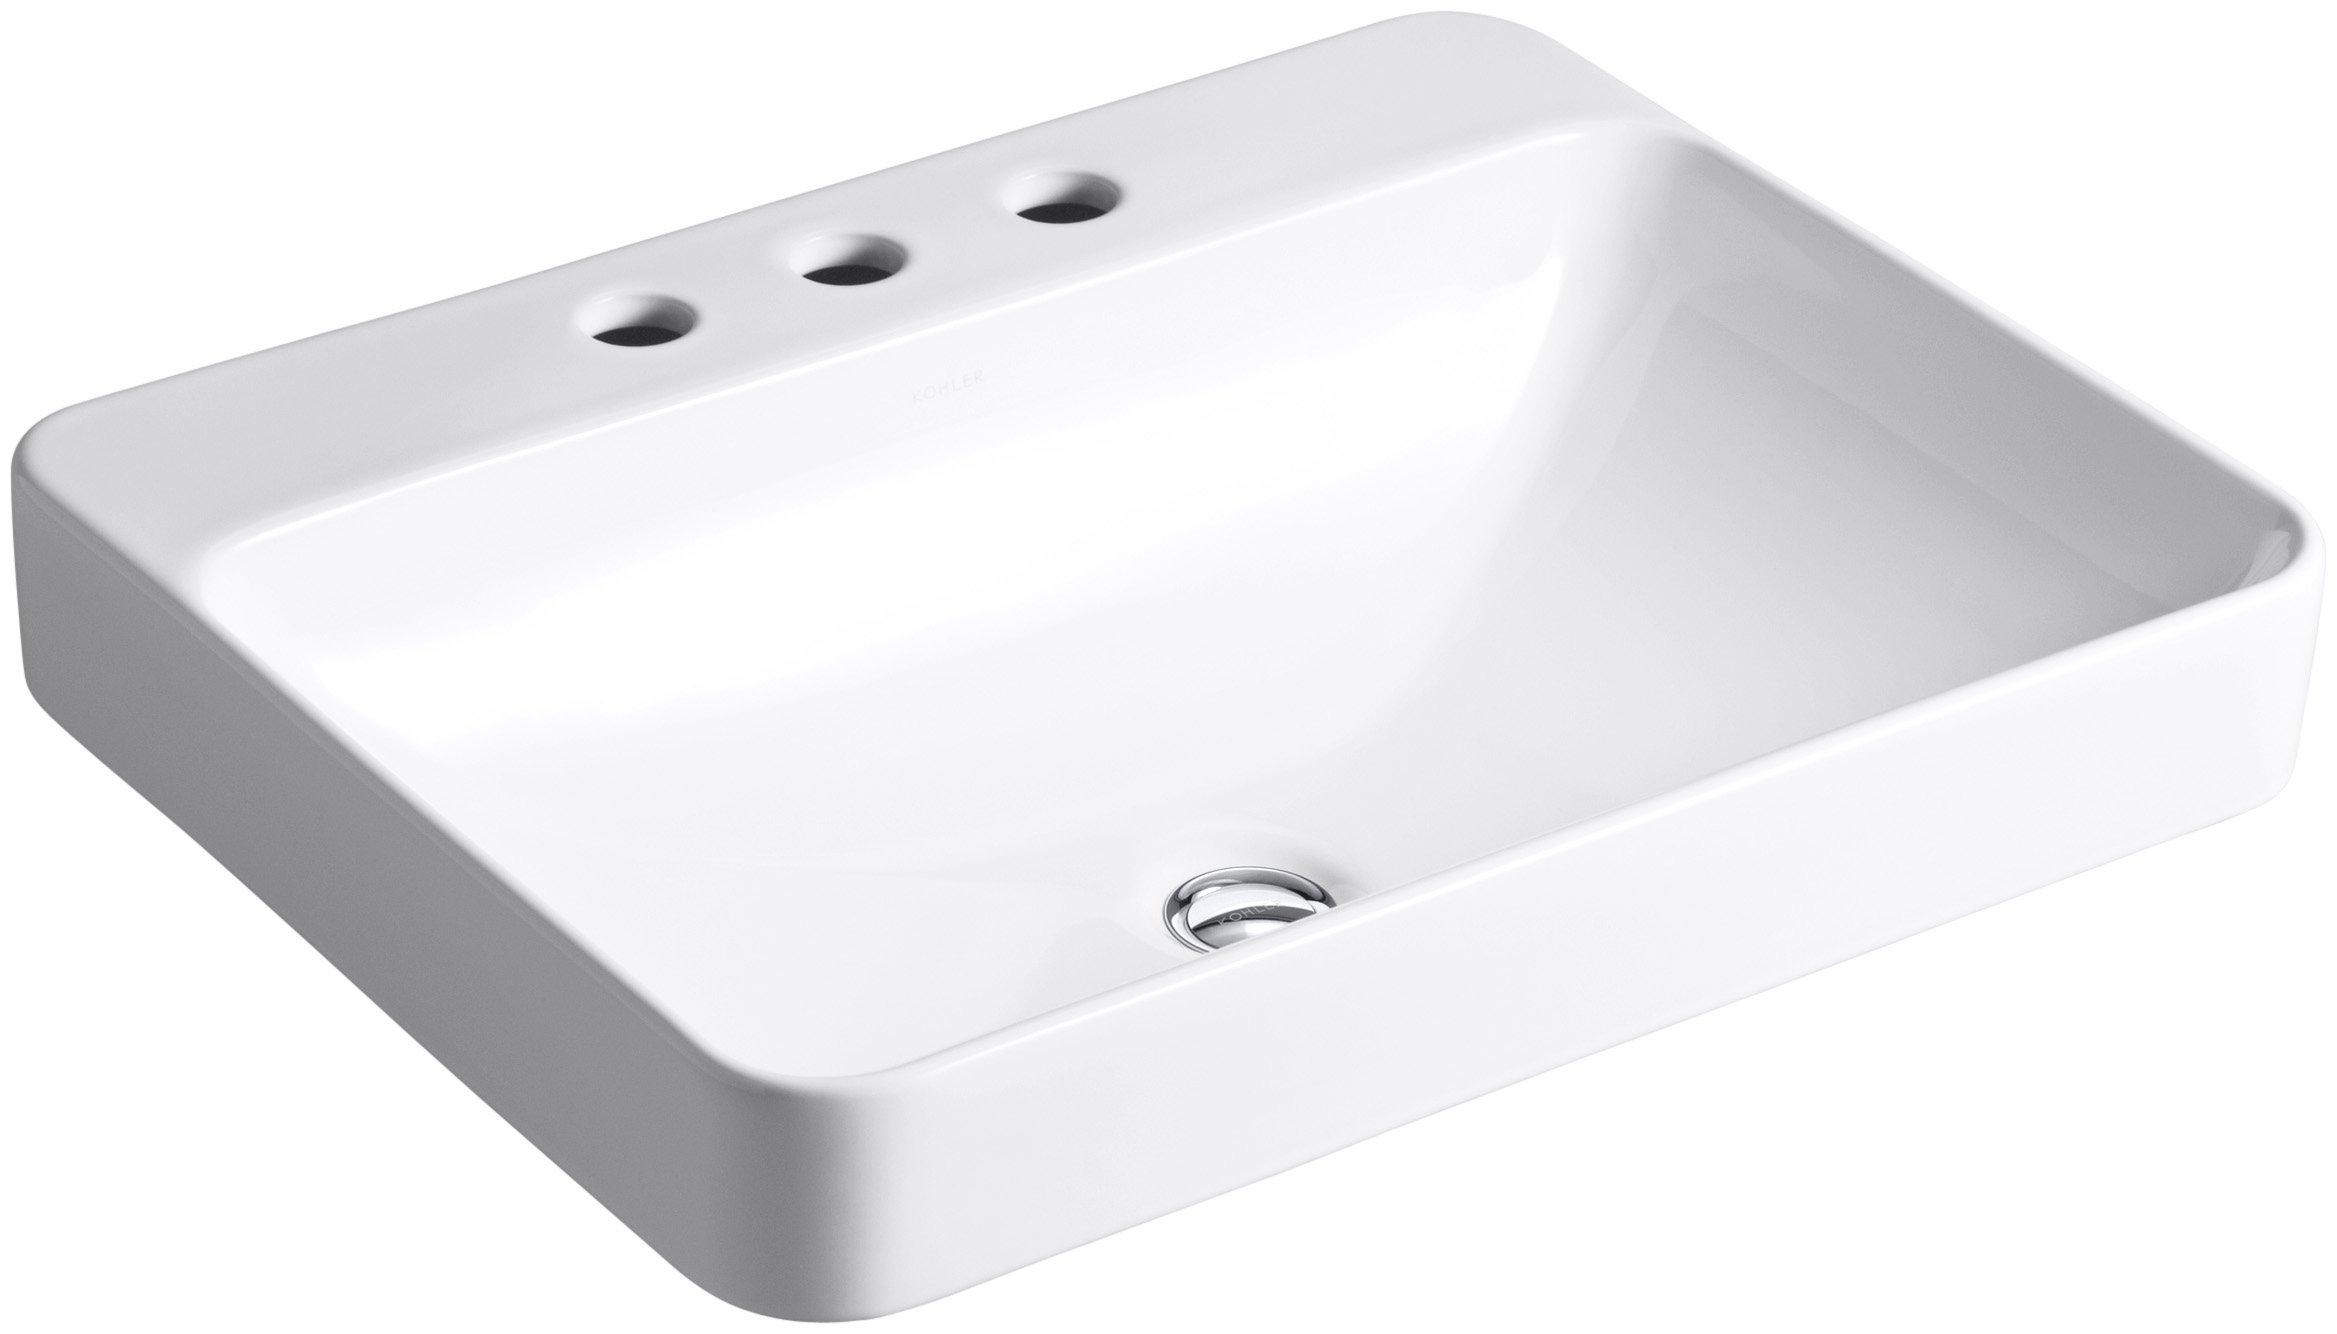 KOHLER K-2660-8-0 Vox Rectangle Vessel with Widespread Faucet Holes, White